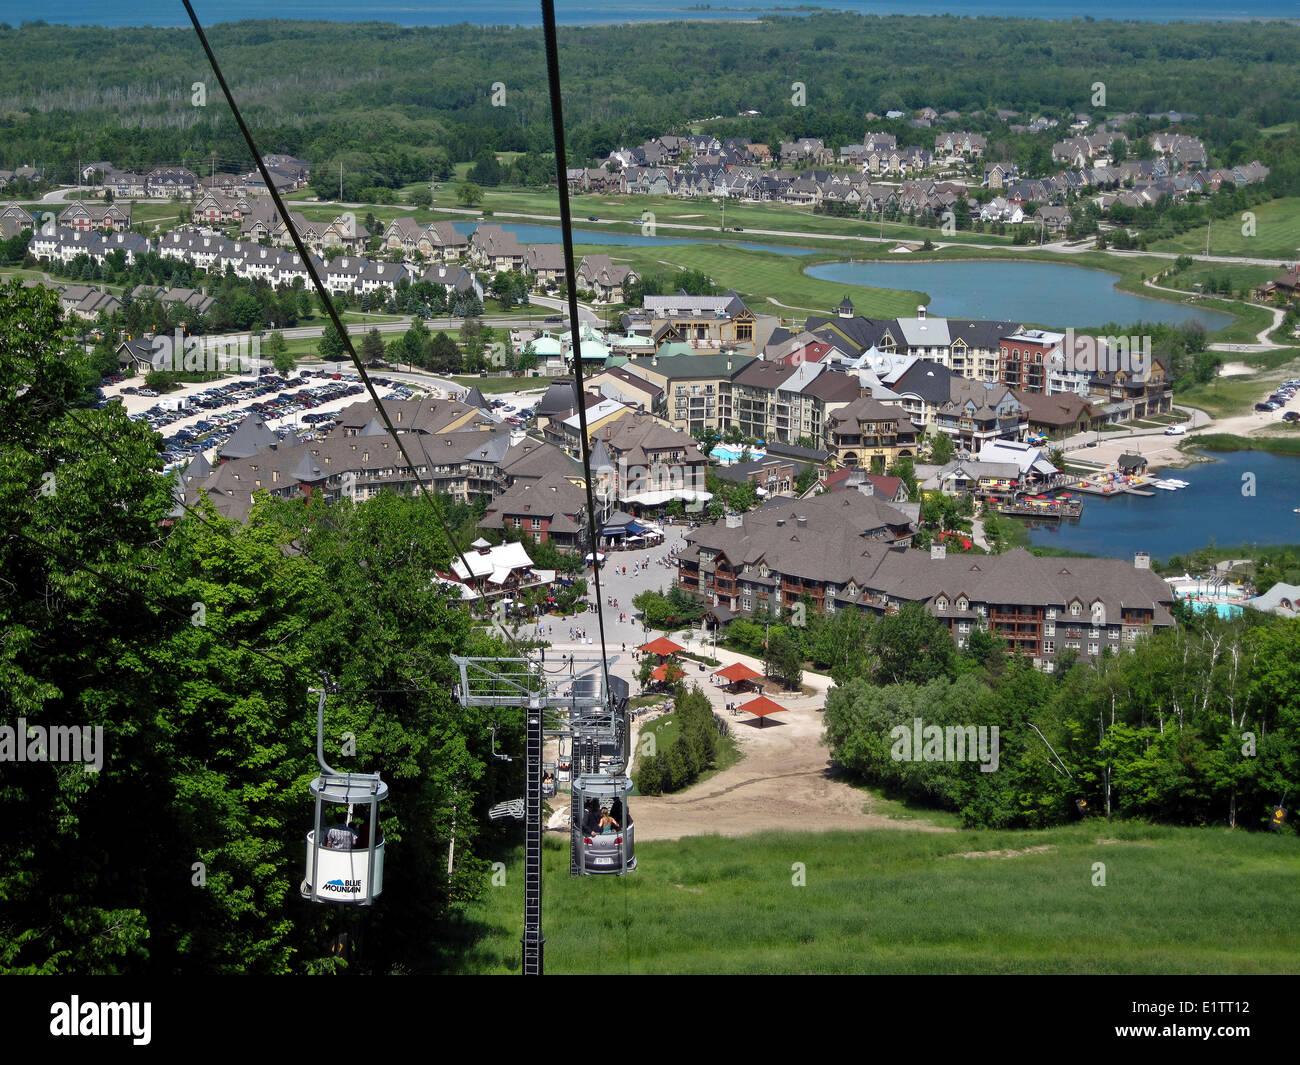 blue mountain ski resort in collingwood, ontario, canada stock photo